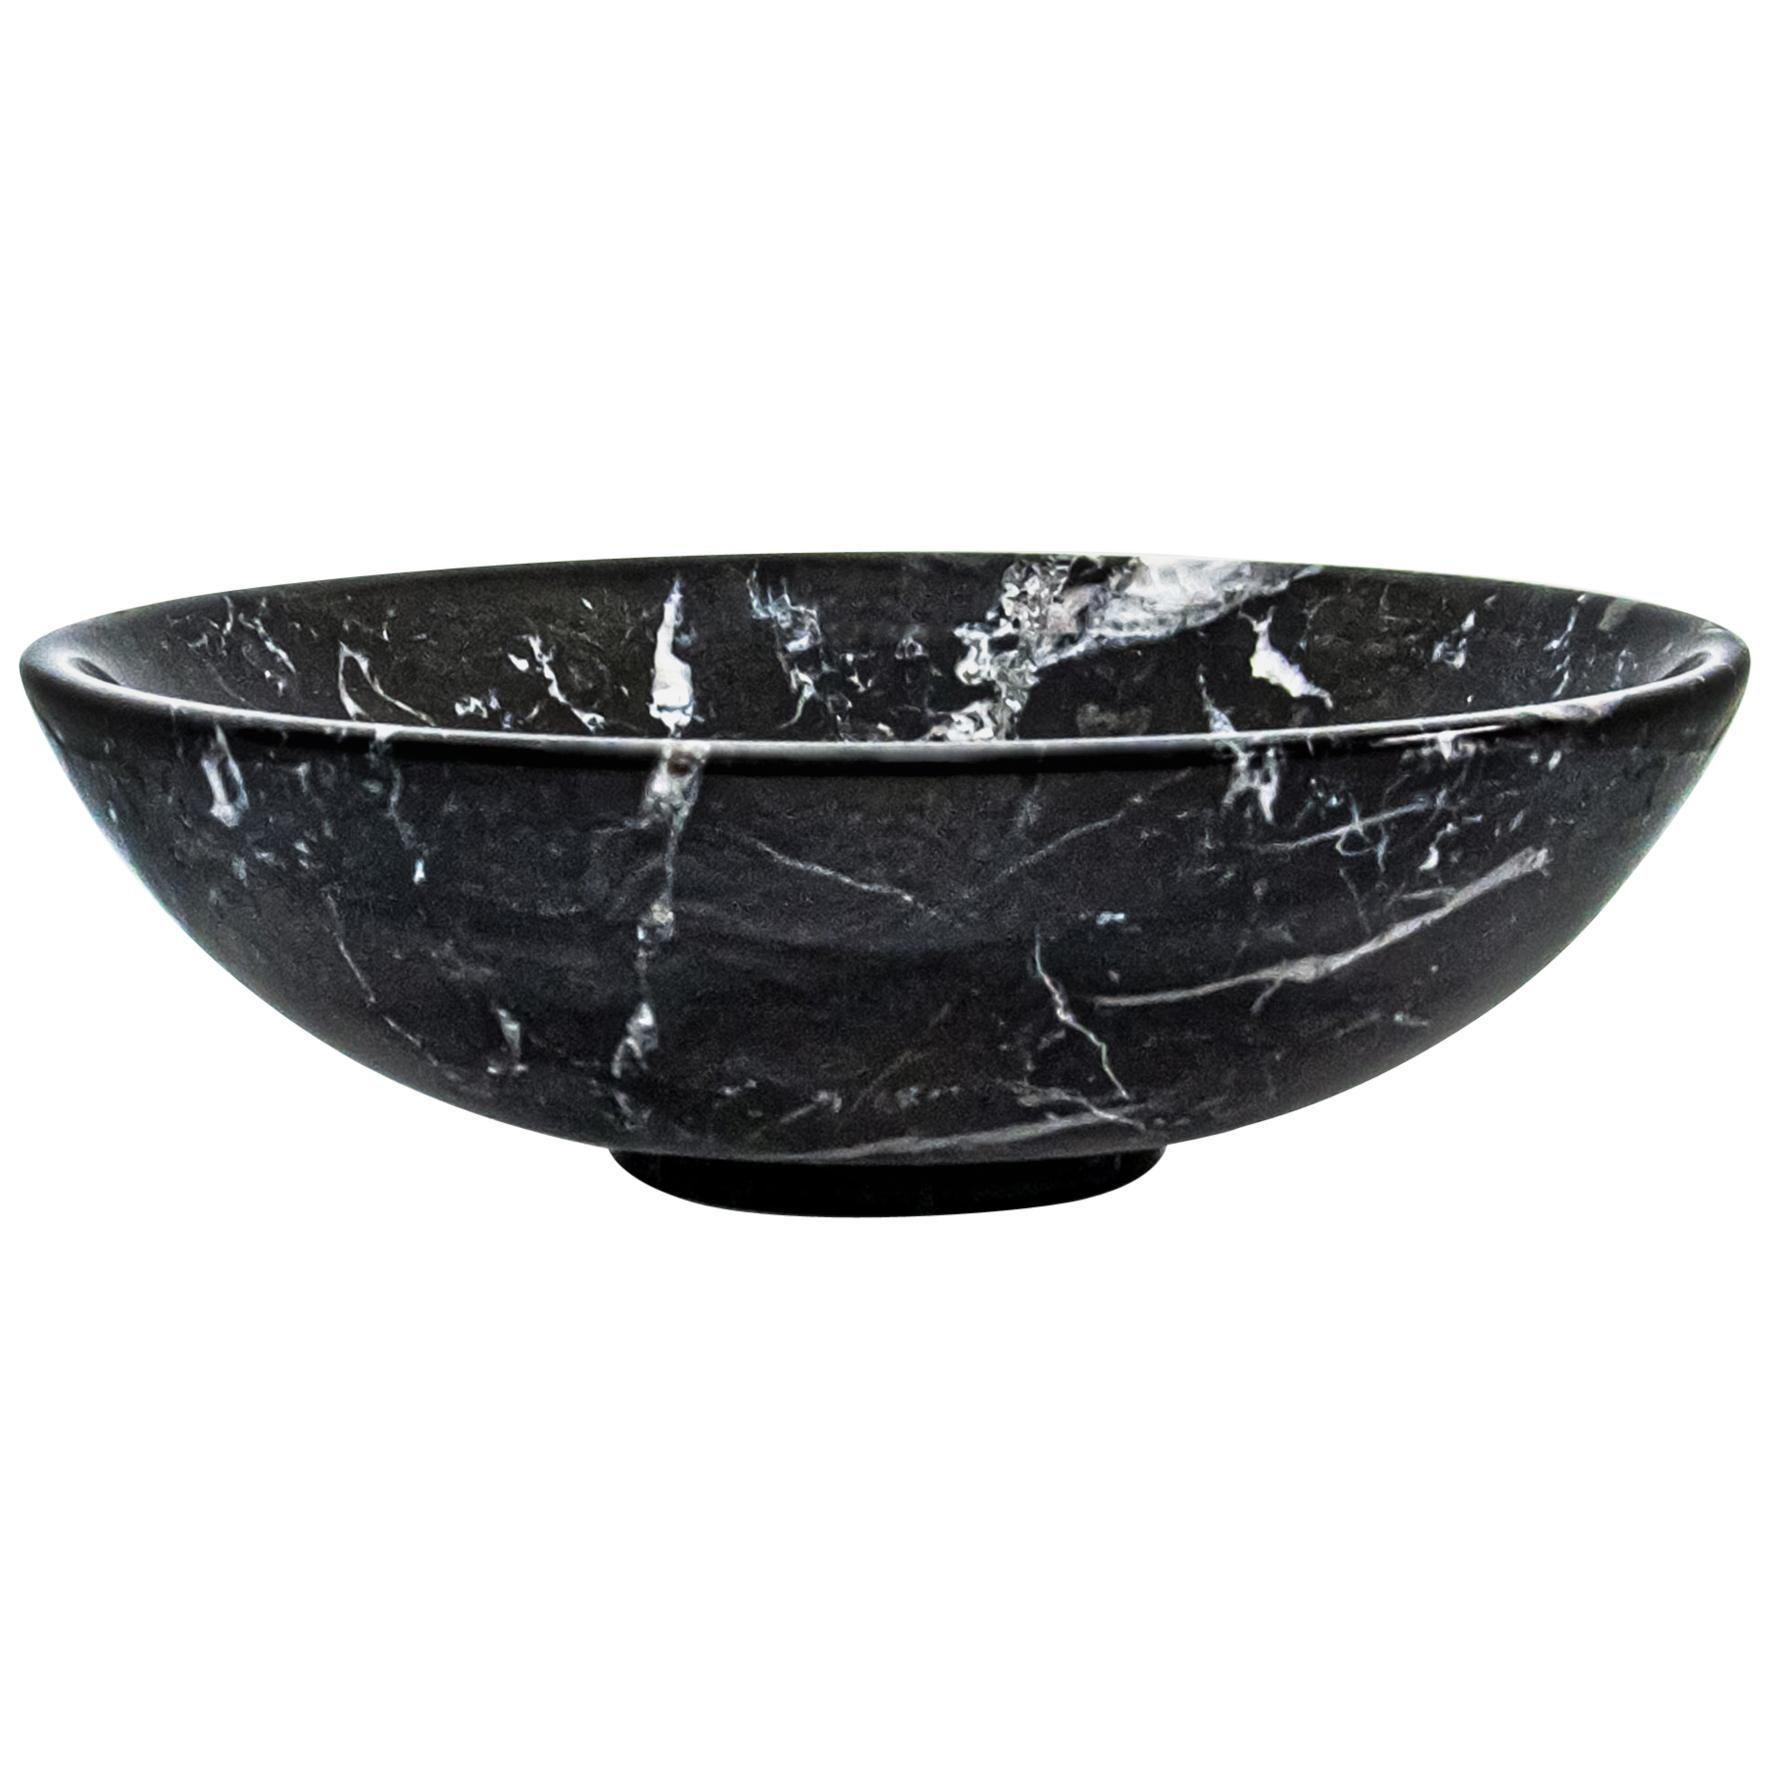 Bowl in Black Marble